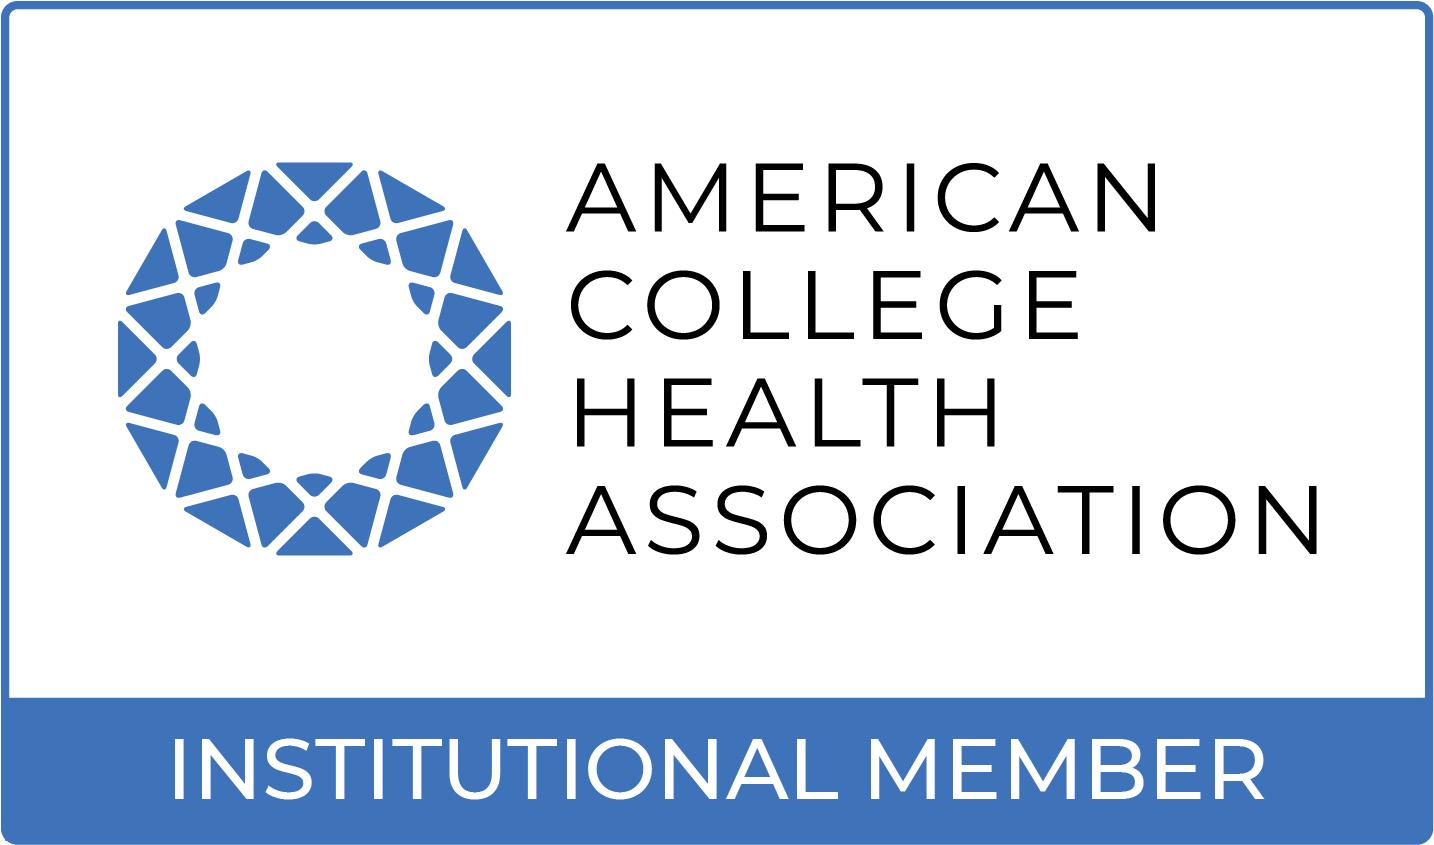 American College Health Association Institutional Member